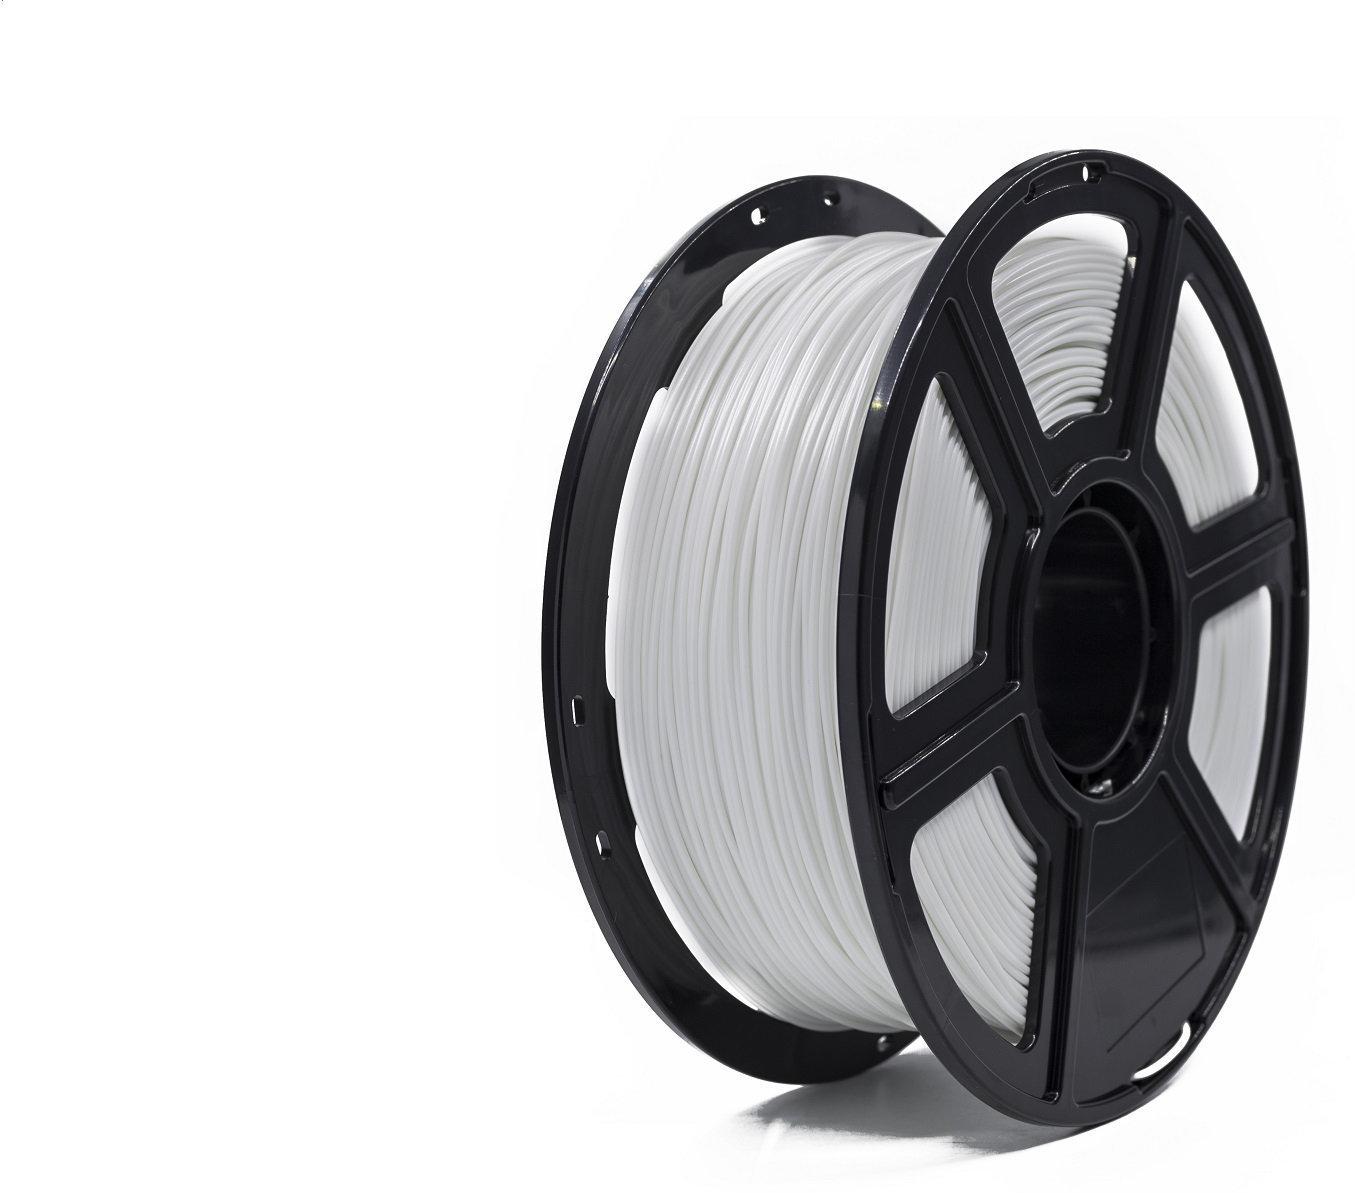 GEARLAB PETG 3D FILAMENT 1.75MM